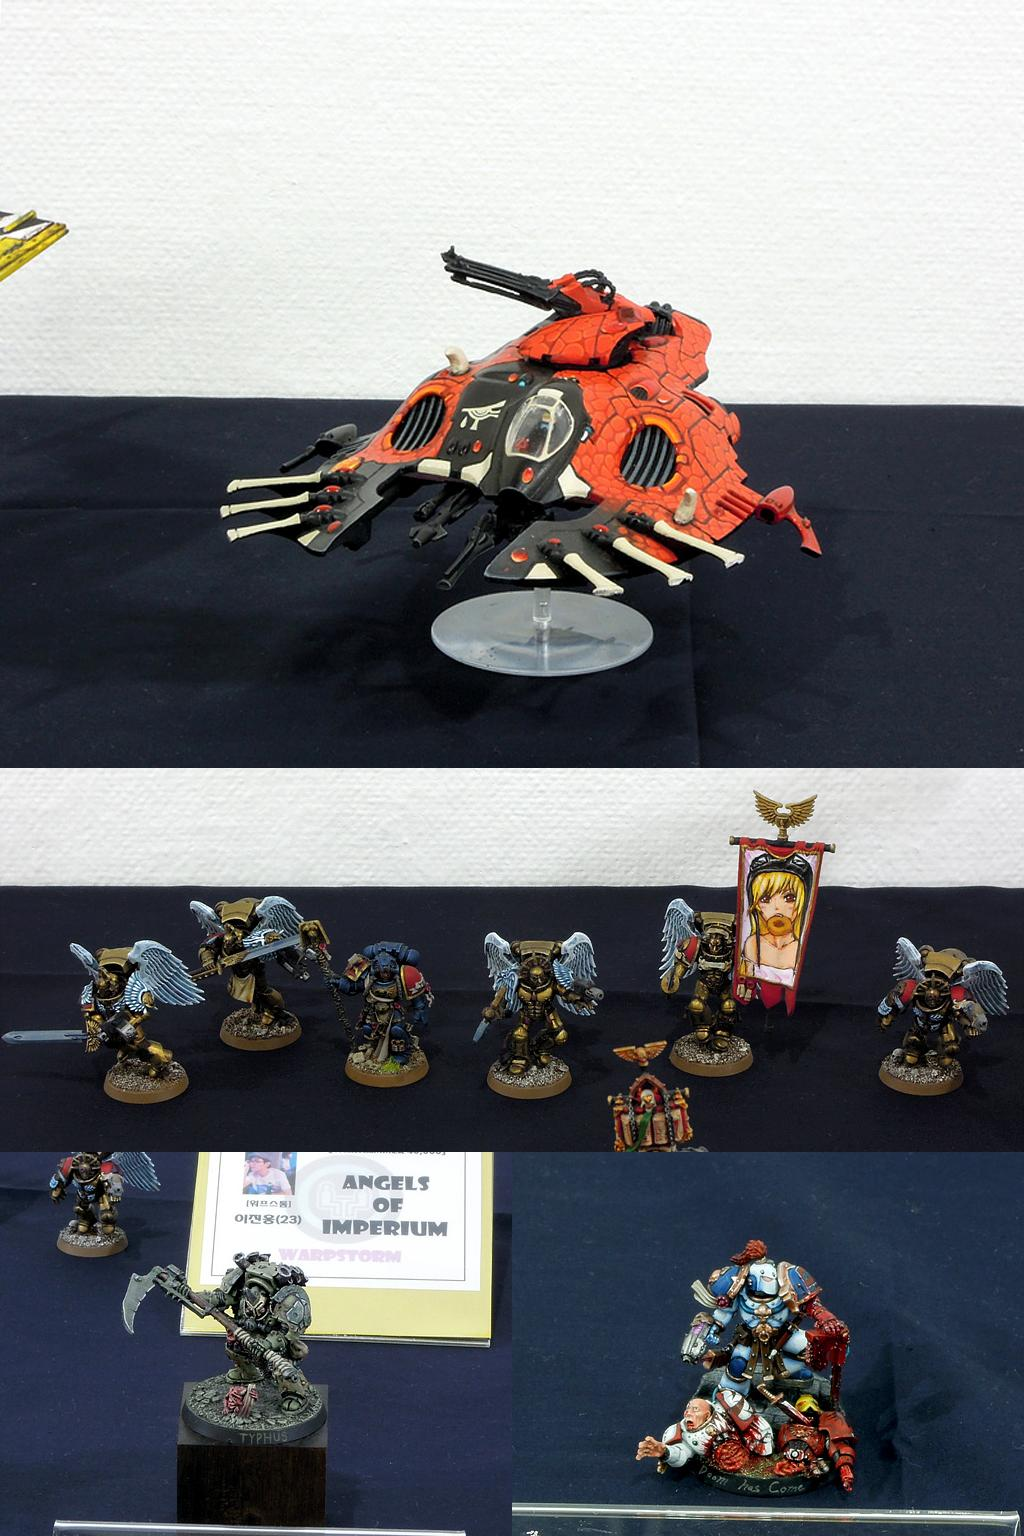 Blood Angels, Chaos Space Marines, Display, Elder, Exhibition, Infinity, Pre-heresy, Warhammer 40,000, Warhammer Fantasy, Wave Serpent